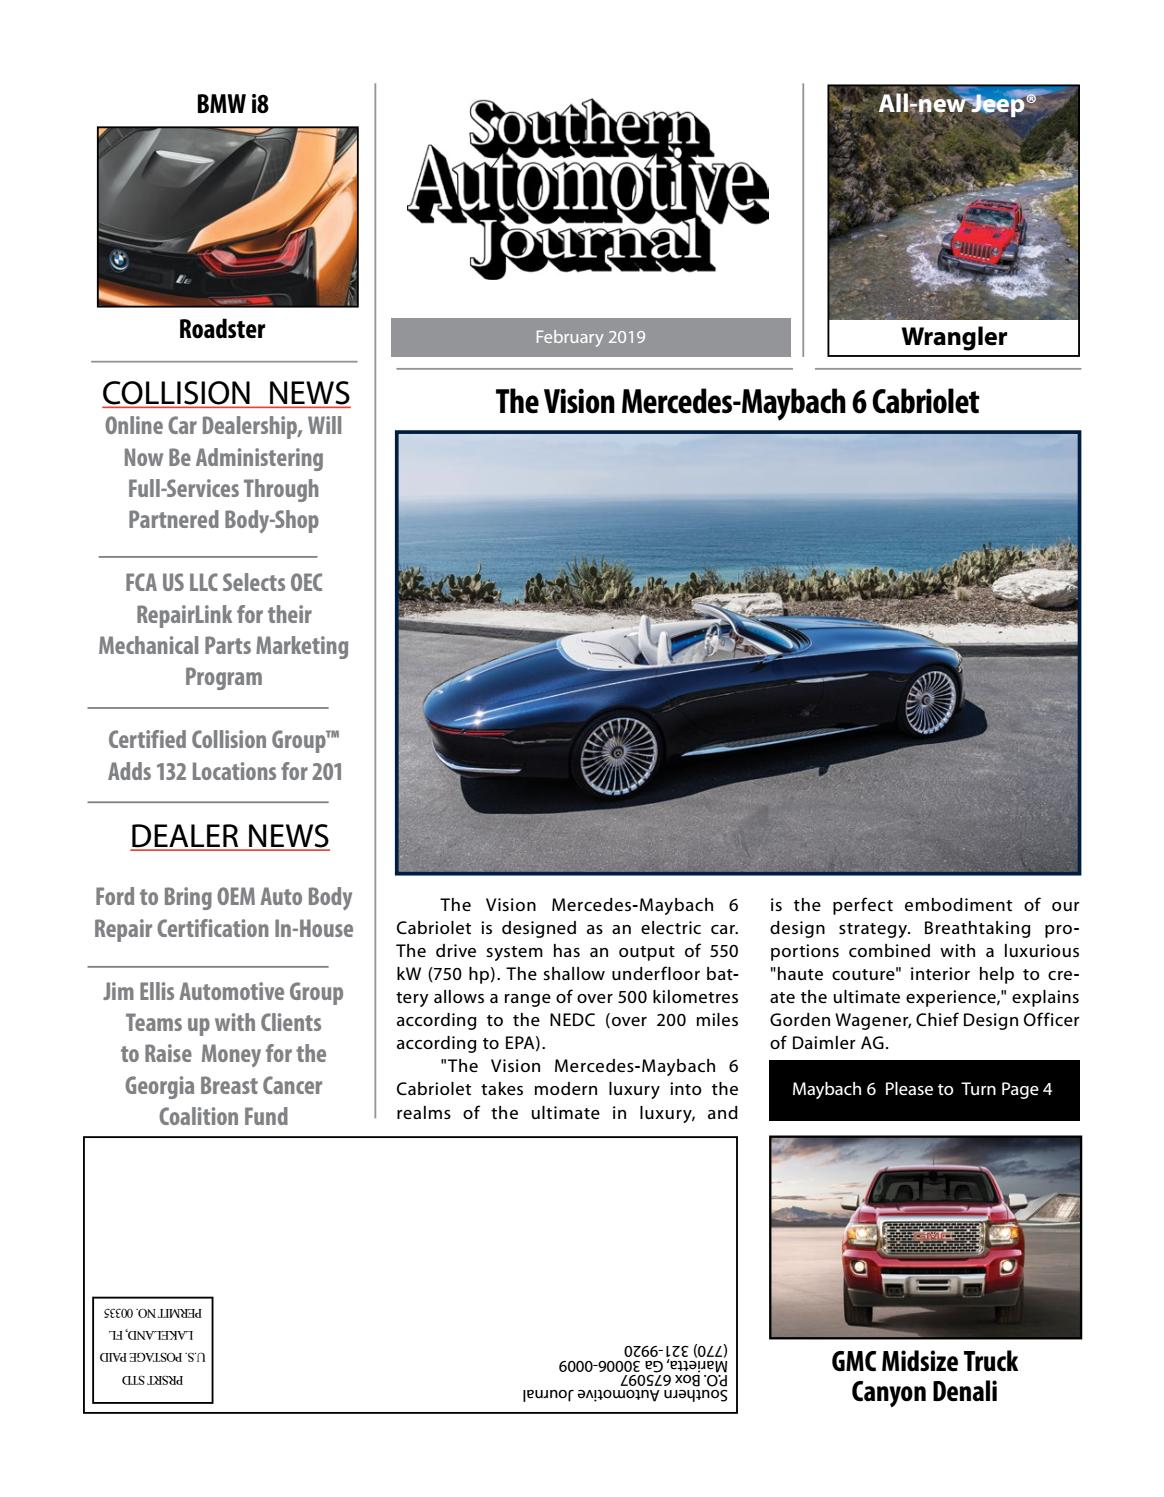 Southern Auto Parts >> Southern Automotive Journal February 2019 By Southern